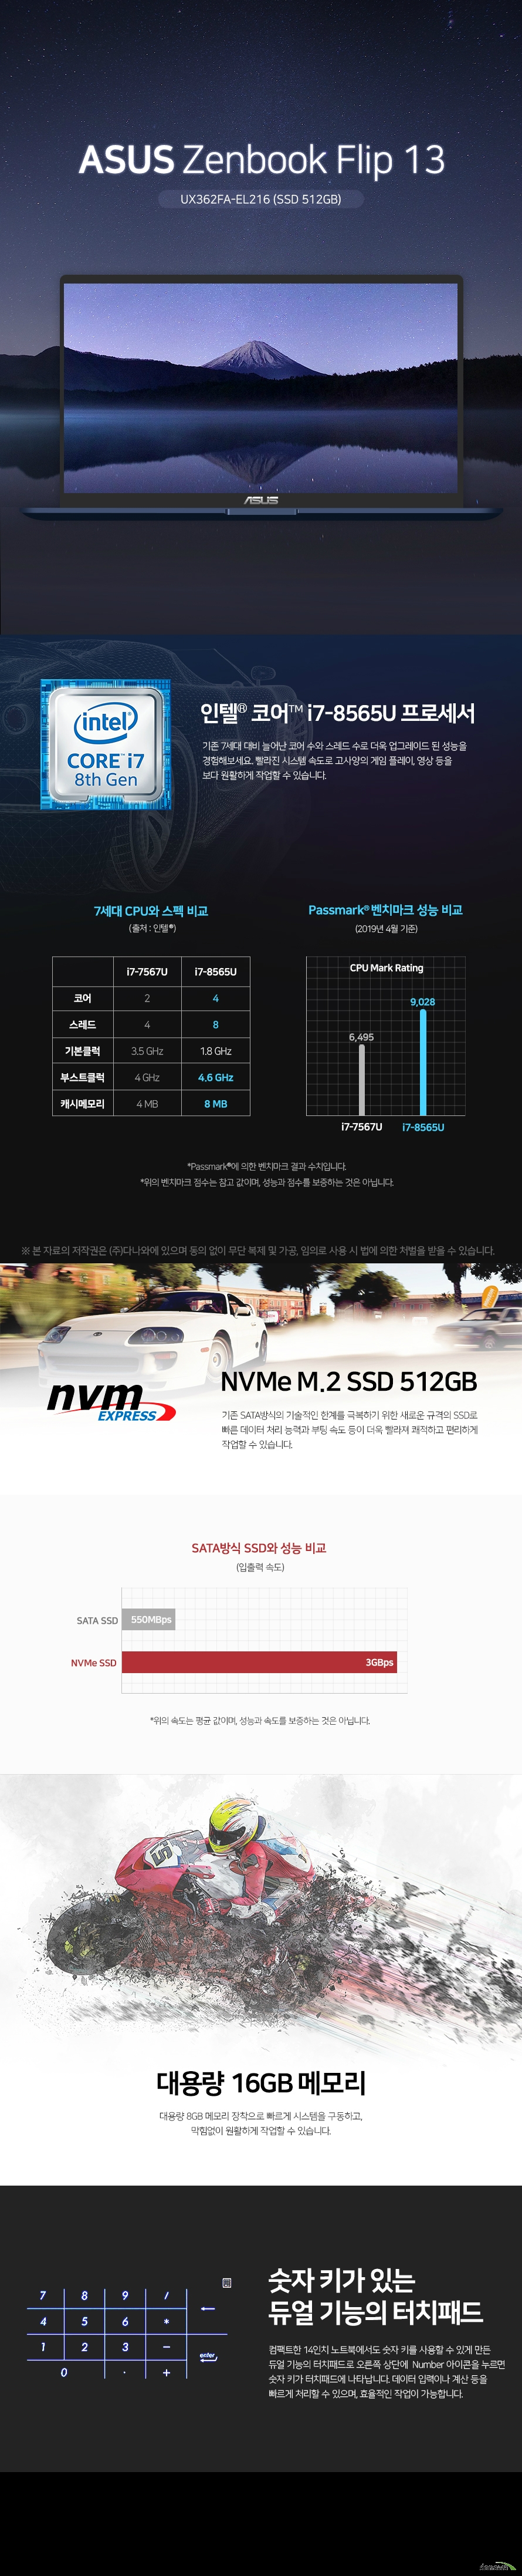 ASUS 젠북 플립 13 UX362FA-EL216 (SSD 512GB) 상세 스펙 인텔 / 코어i7-8세대 / 위스키레이크 / i7-8565U 1.8GHz(4.6GHz) / 쿼드 코어 / 33.78cm(13.3인치) / 1920x1080(FHD) / 광시야각 / 슬림형 베젤 / 터치스크린 / 회전LCD / 16GB / M.2(NVMe) / 512GB / UHD 620 / VRAM:시스템메모리공유 / HDMI / 웹캠 / USB Type-C / USB 2.0 / 키보드 라이트 / MIL-STD / 블록 키보드 / 얼굴 인식 / 전용 펜 지원 / 50Wh / 운영체제 미포함 / 두께:16.9mm / 1.3Kg / 용도: 사무/인강용 , 휴대용 / 색상: 블루